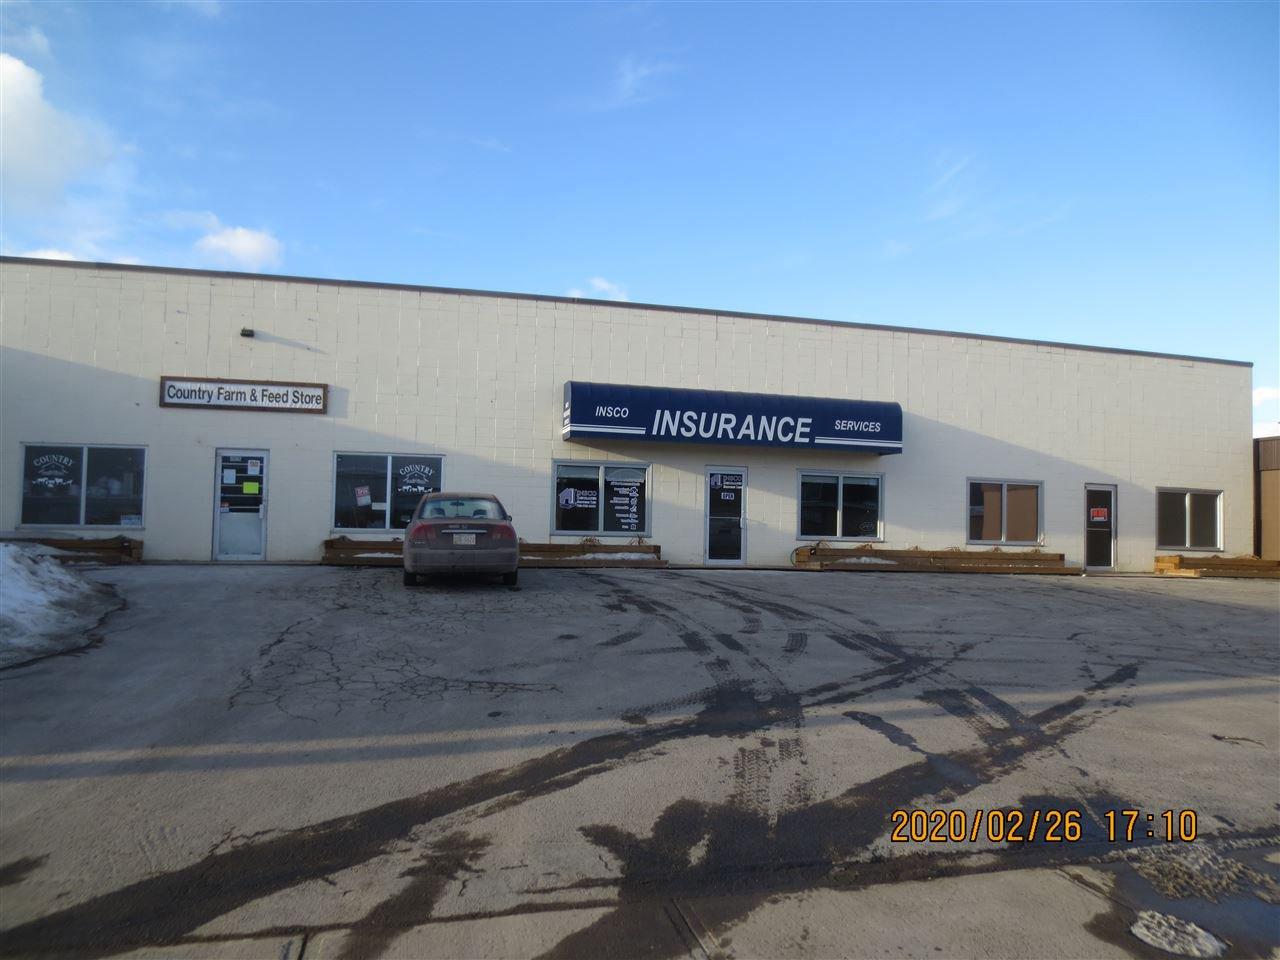 Main Photo: 4826 & 4824 3 Avenue: Edson Retail for lease : MLS®# E4189519